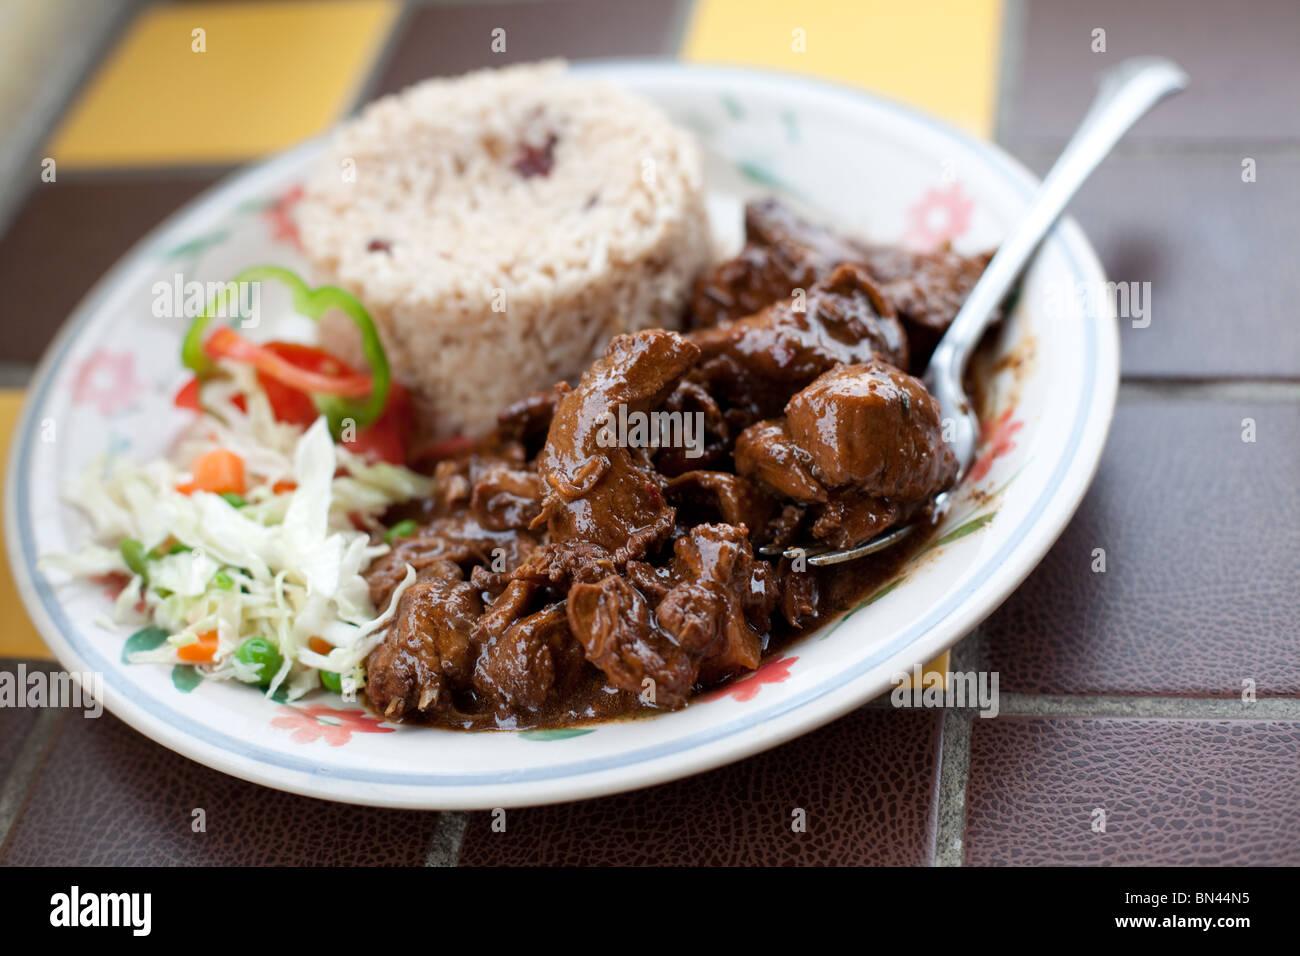 Special Sauce Stockfotos & Special Sauce Bilder - Alamy